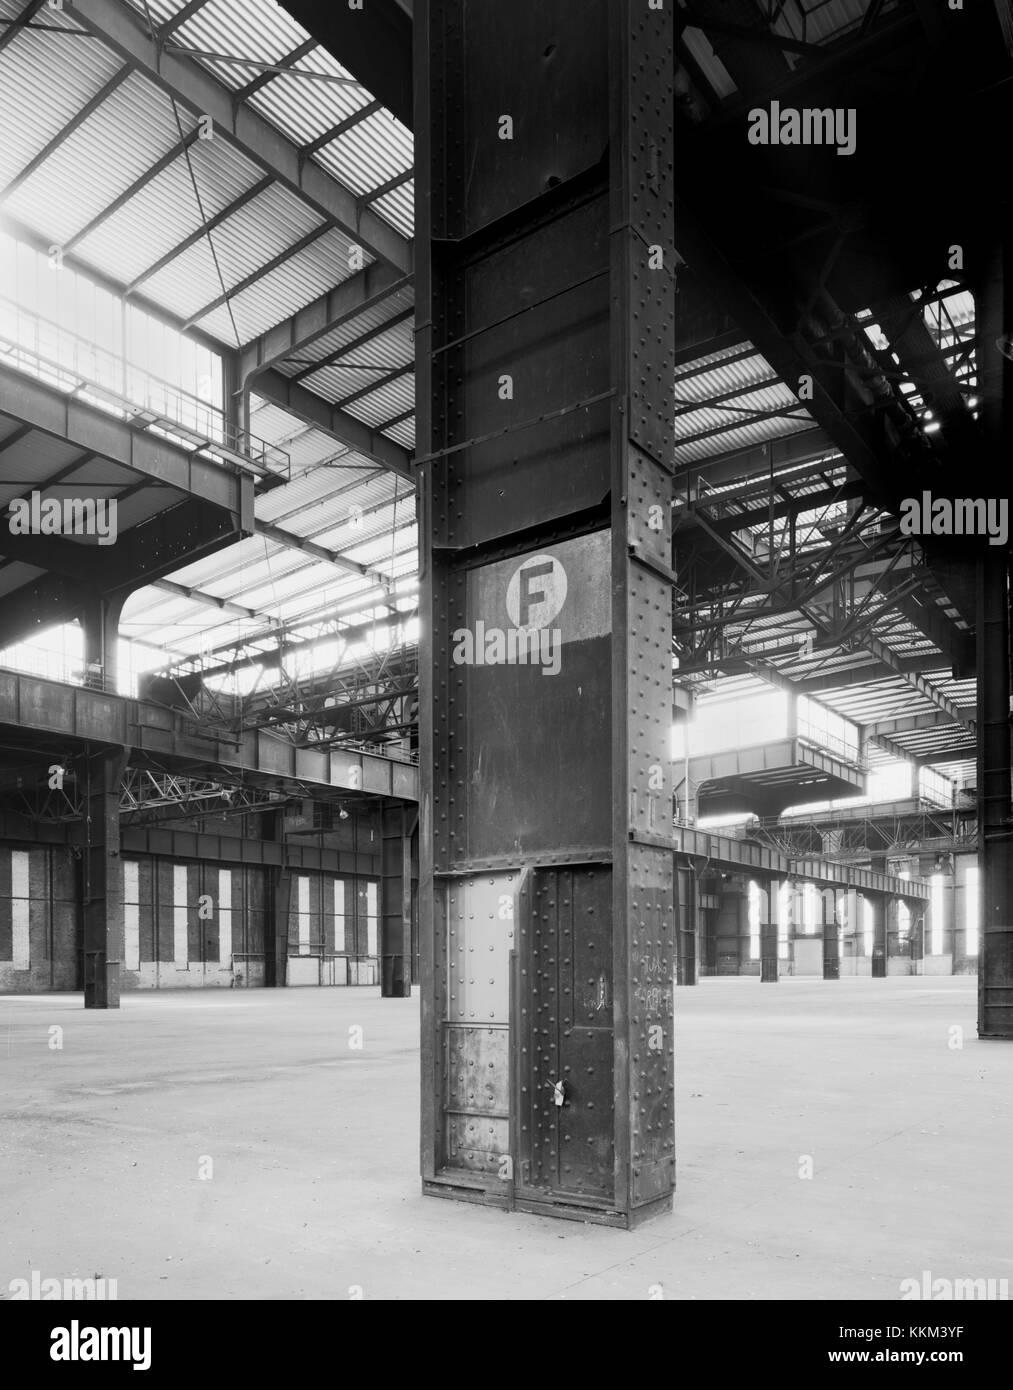 Hanomag U Boot Halle Hannover - Stock Image